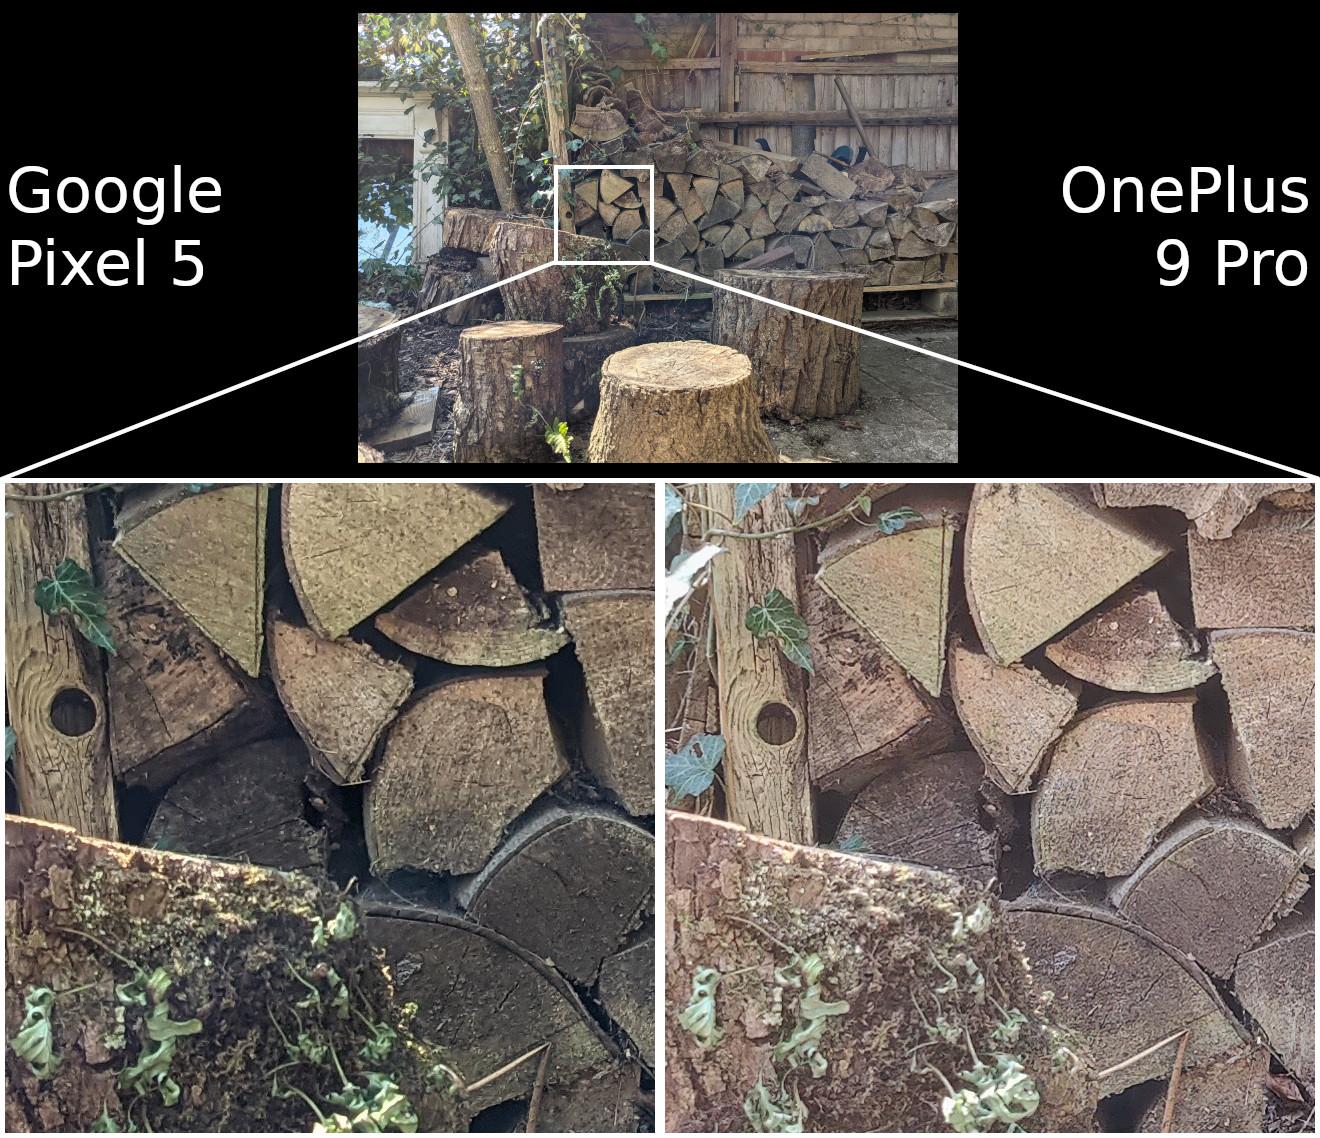 Google Pixel 5 vs OnePlus 9 Pro detail